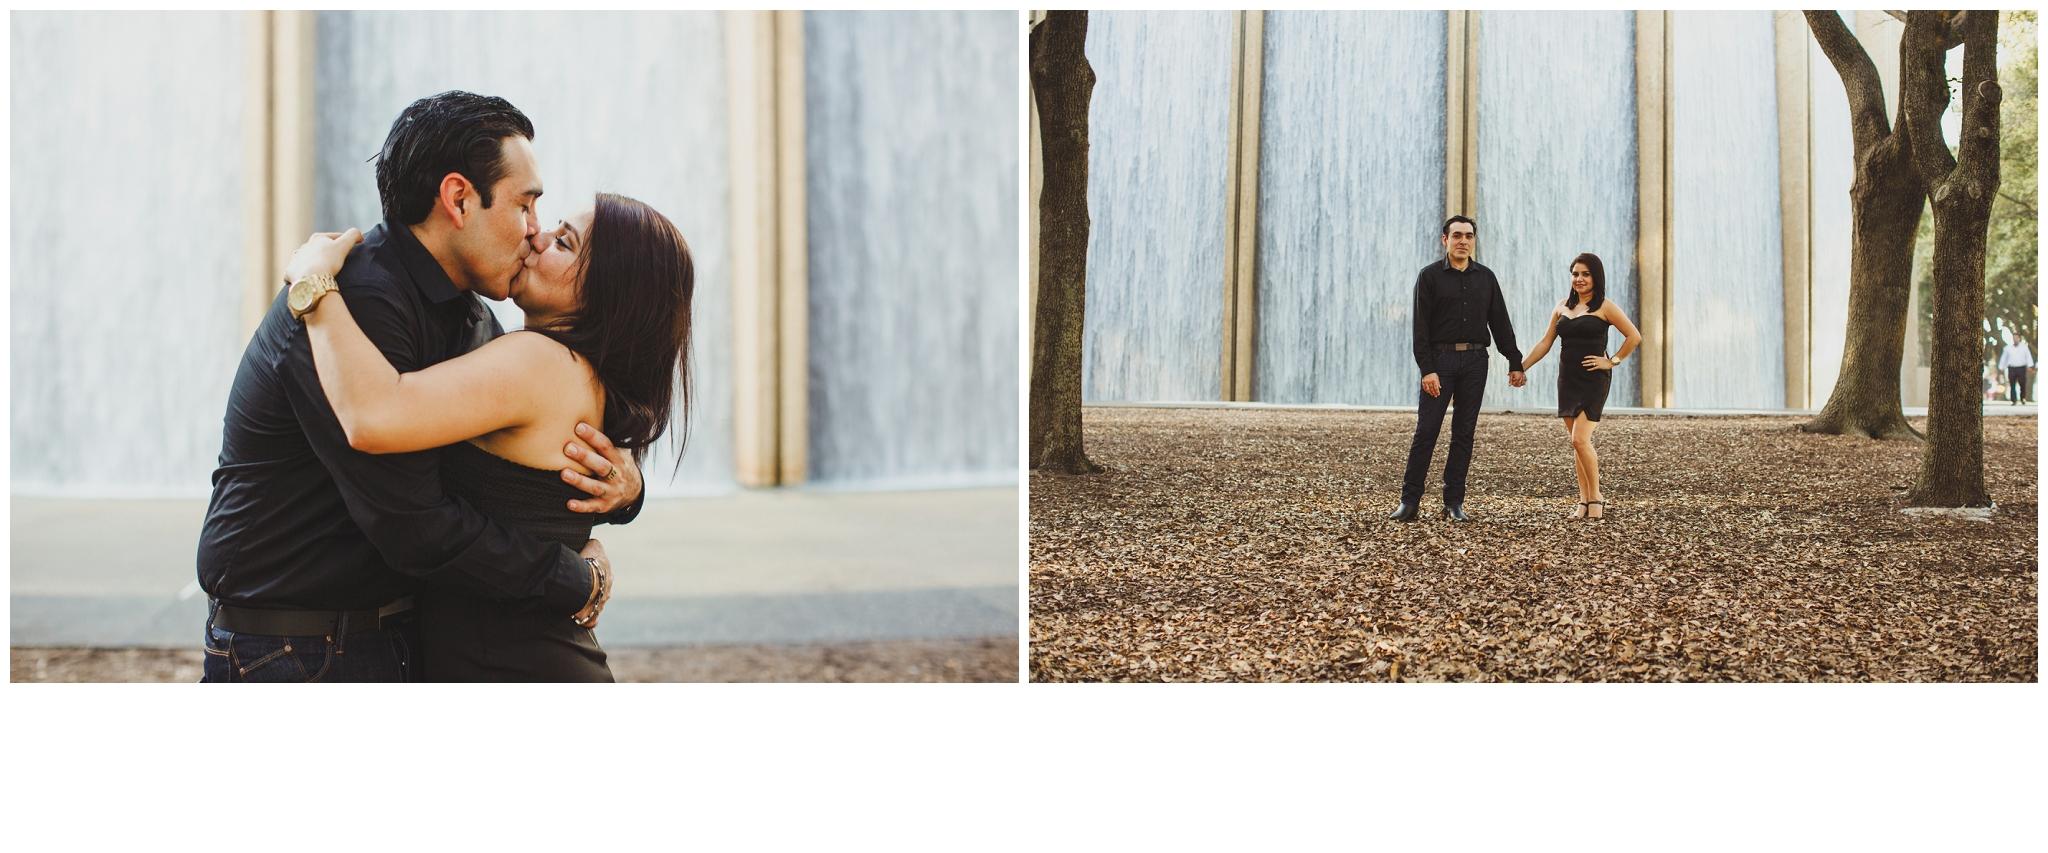 houston-engagement-photographer-waterwall-proposal-downtown_0003.jpg